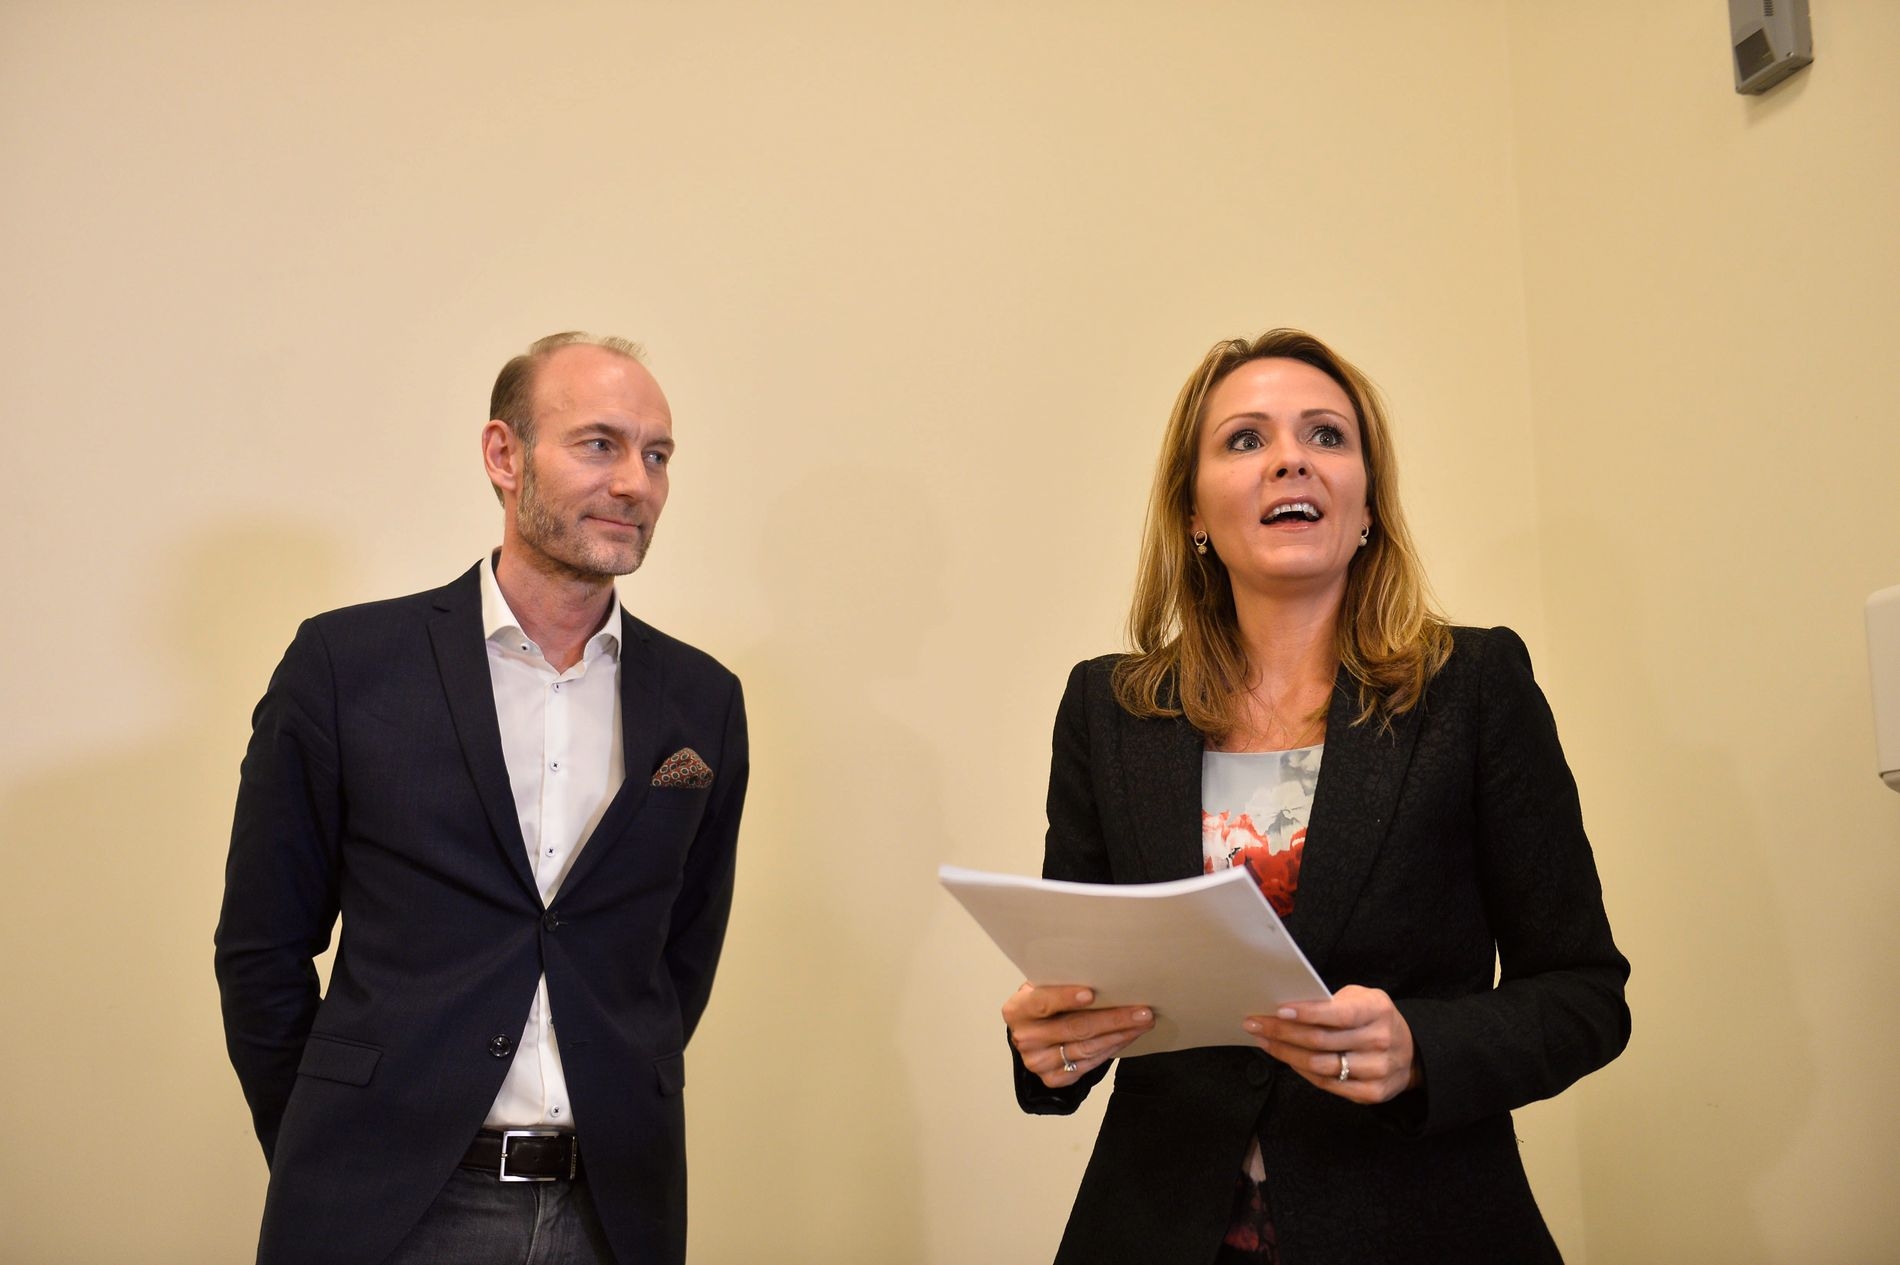 OVERLEVERTE RAPPORT: Knut Olav Åmås, leder av Mediemangfoldsutvalget, overleverte sin rapport til kulturminister Linda Hofstad Helleland (H) tirsdag formiddag.